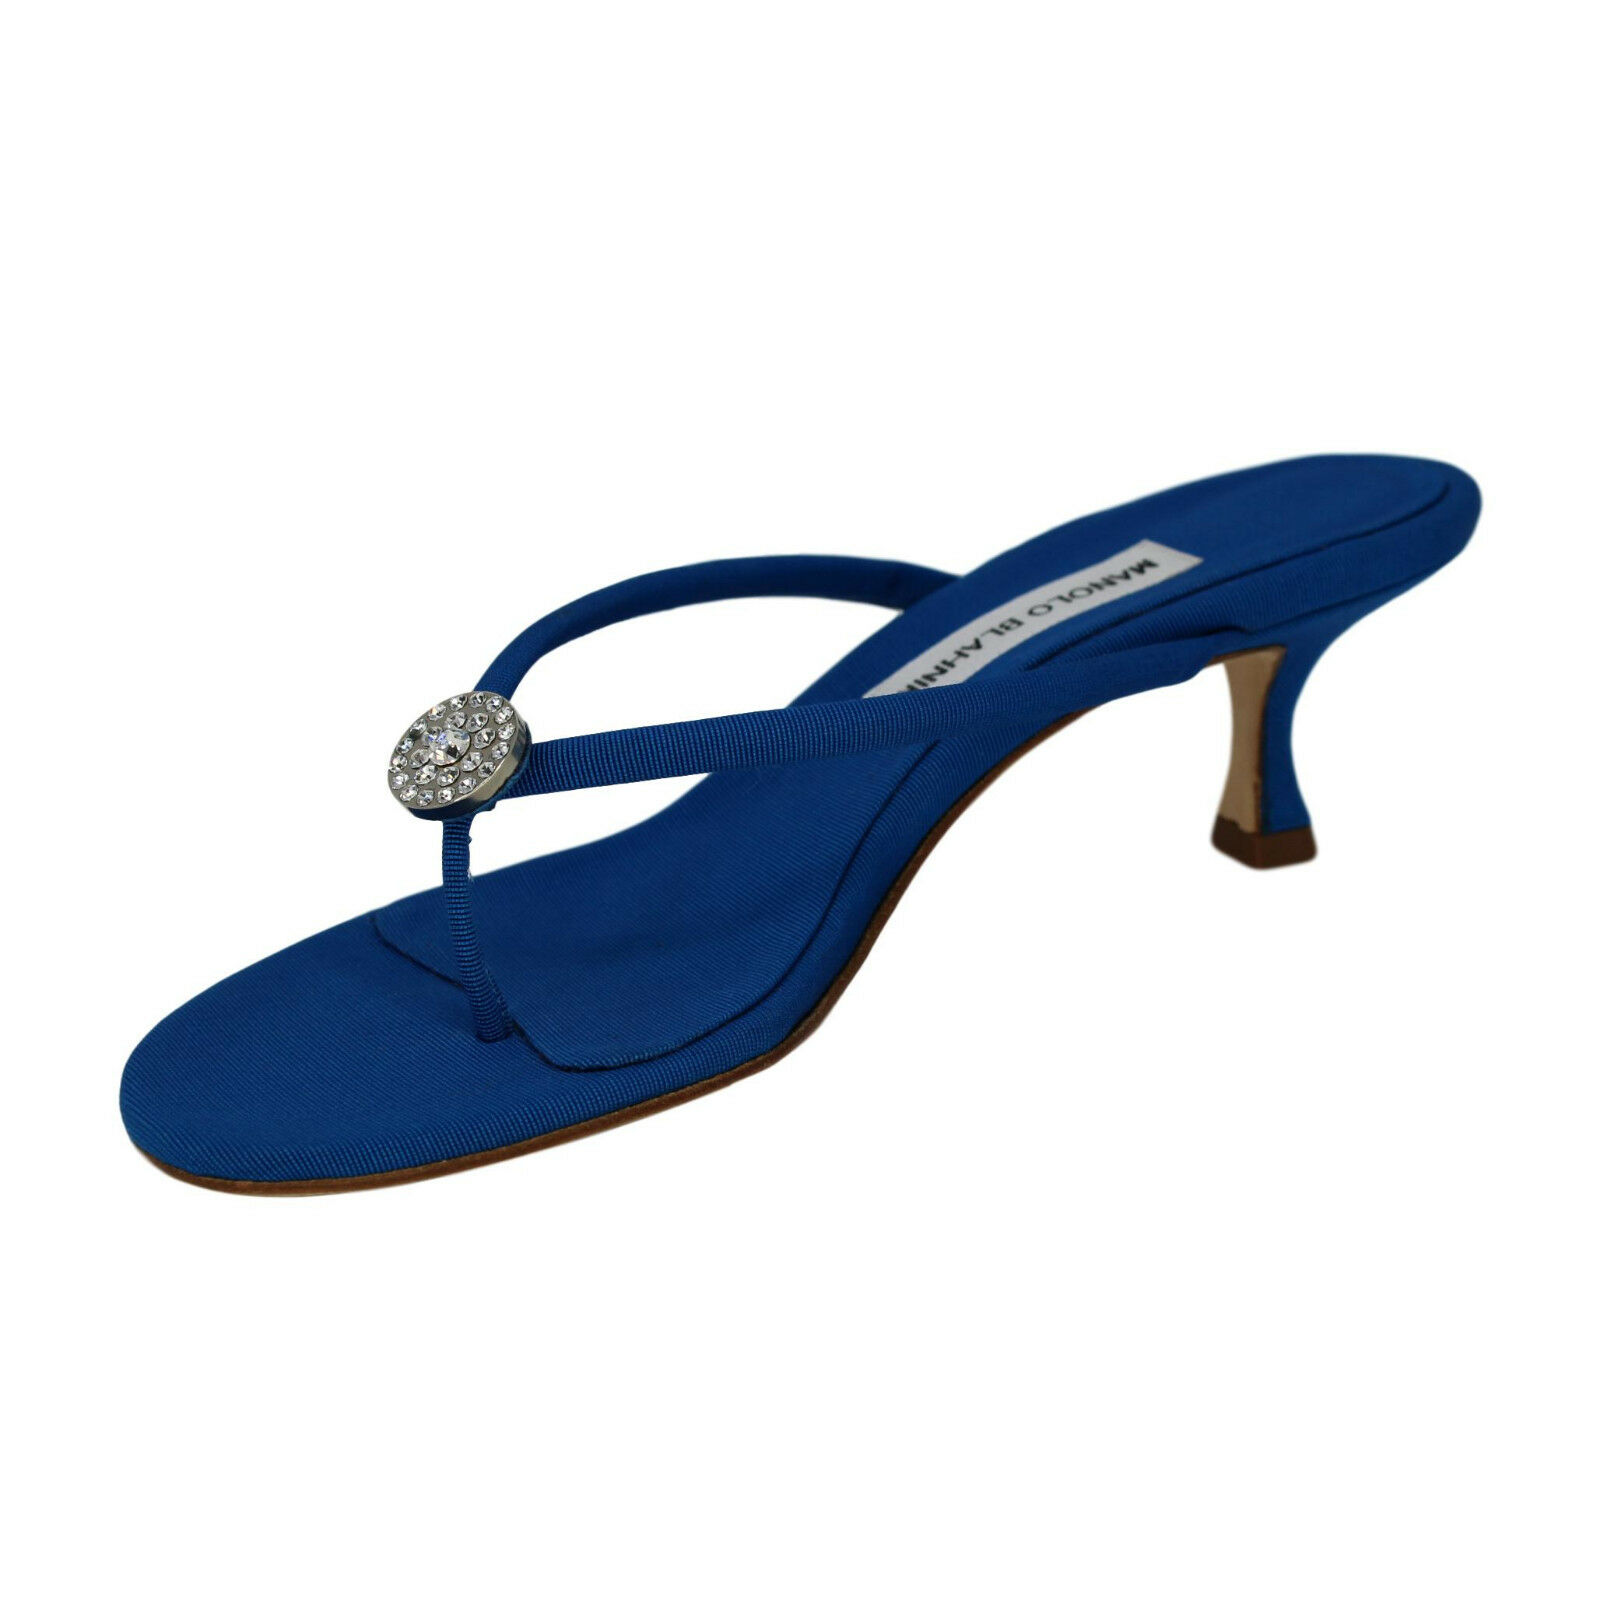 Manolo blahnik azul Grogrén  Dole    Cristal Sandalias-US 8.5, Ret   495  ¡no ser extrañado!